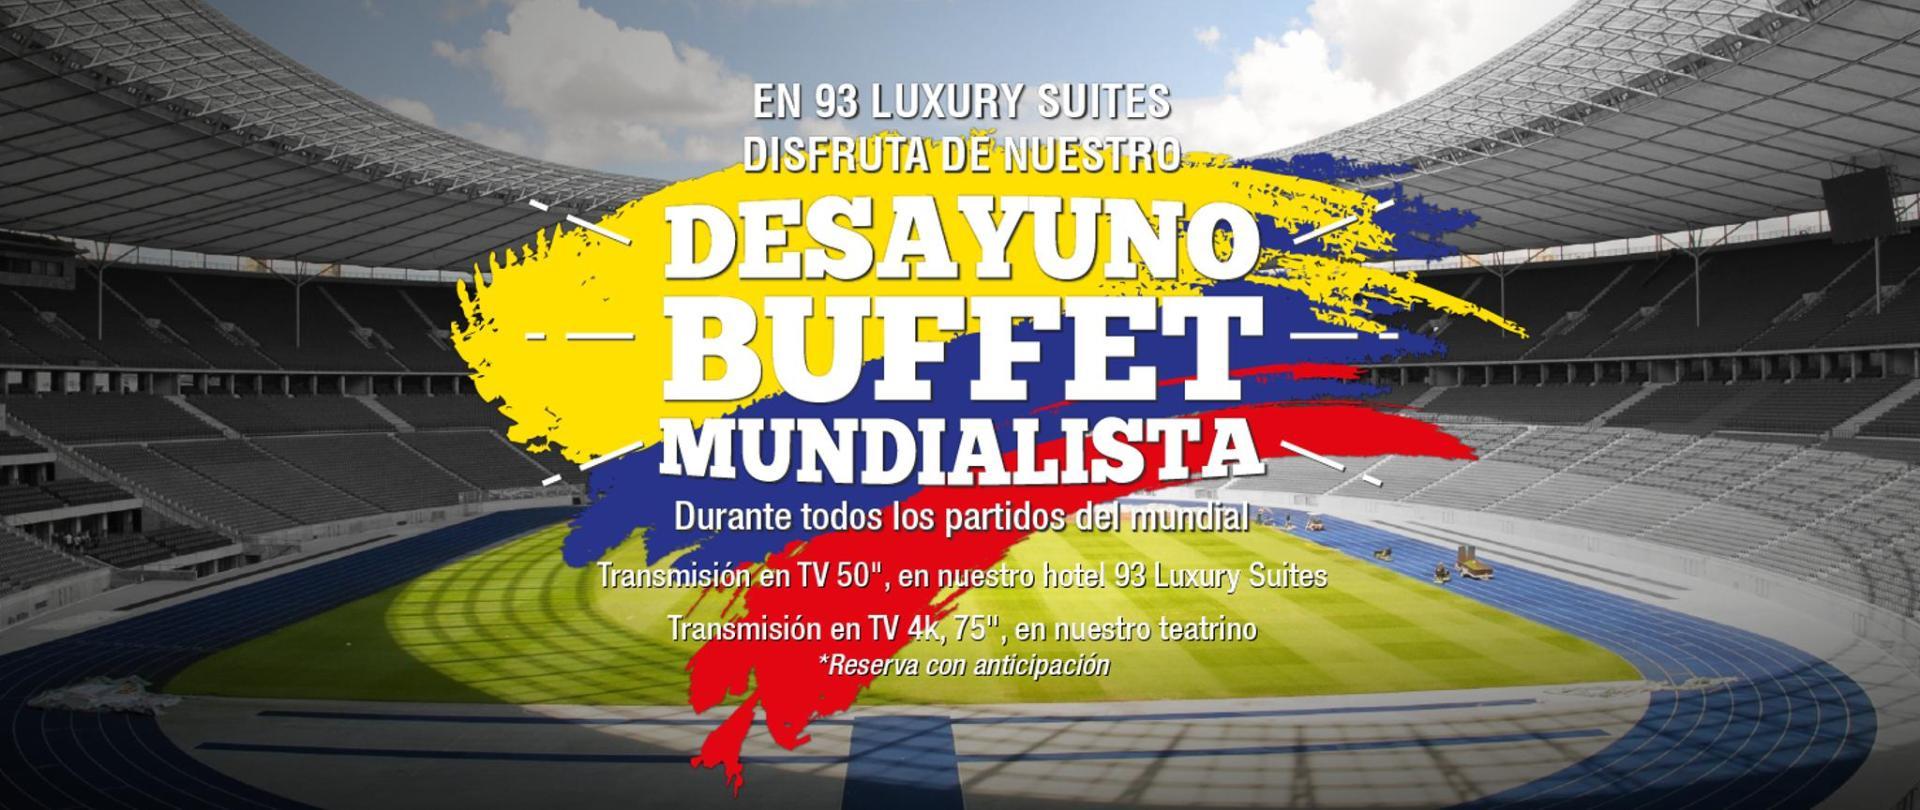 BannerBuffetMundialista93.png